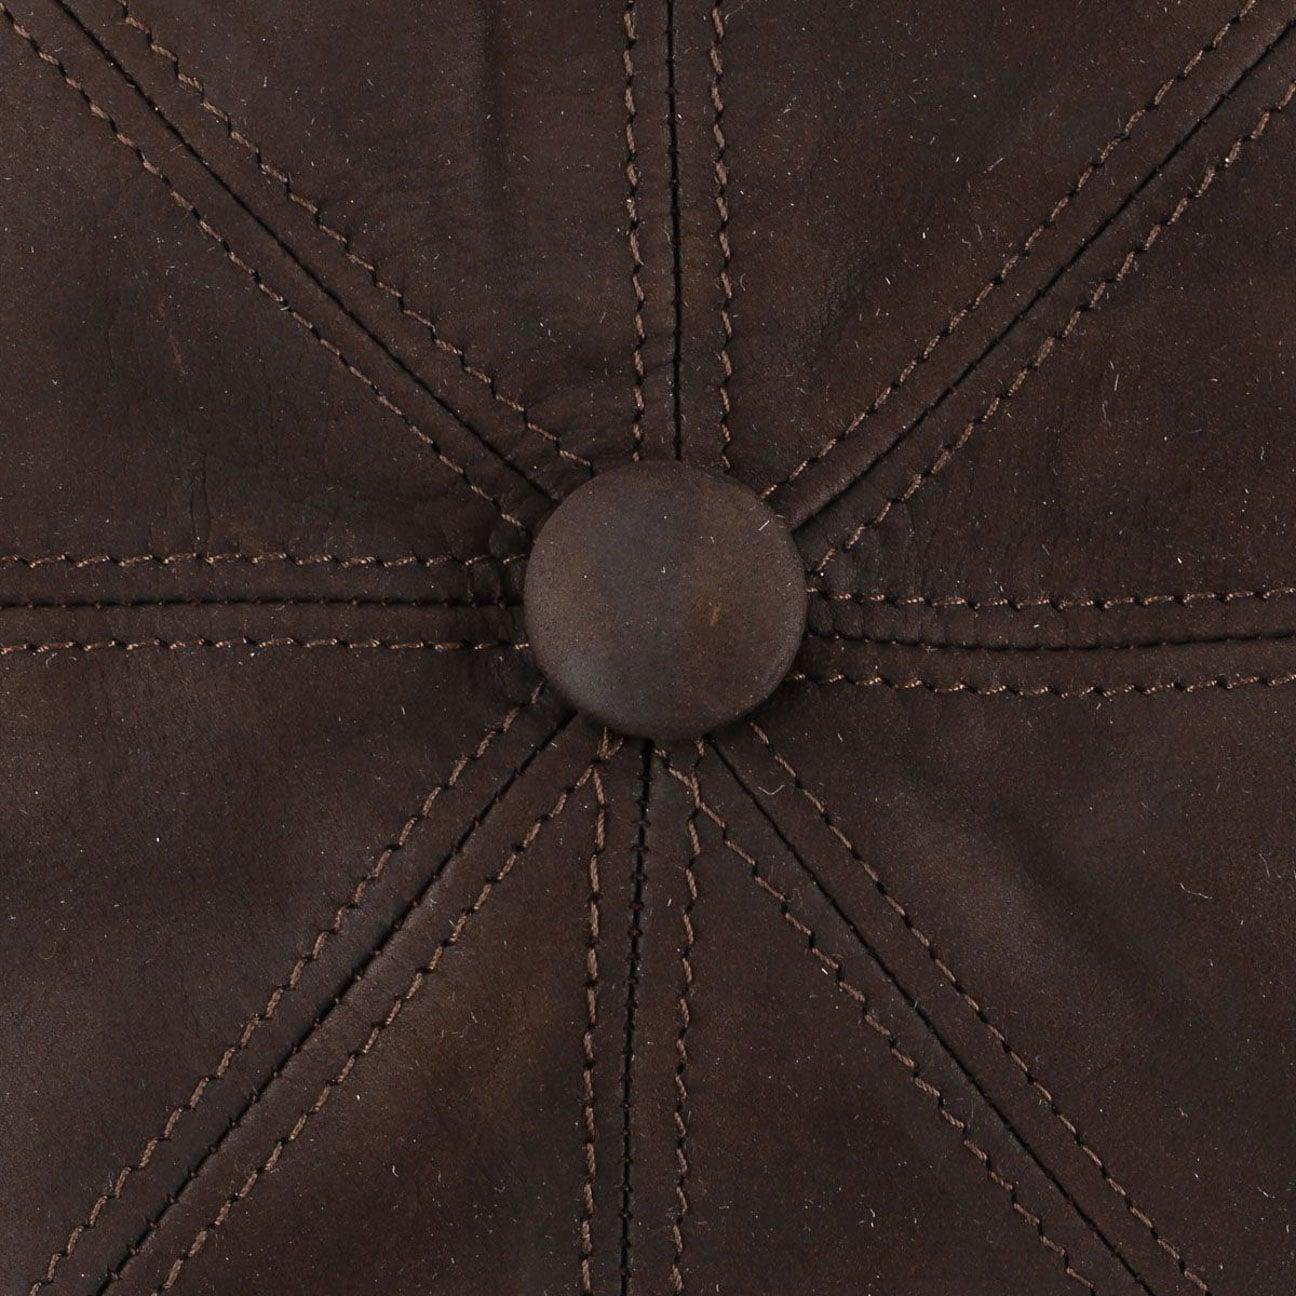 3c5285e18cd462 ... Nappa Wax Leather Flat Cap by Lierys - dark brown 4 ...